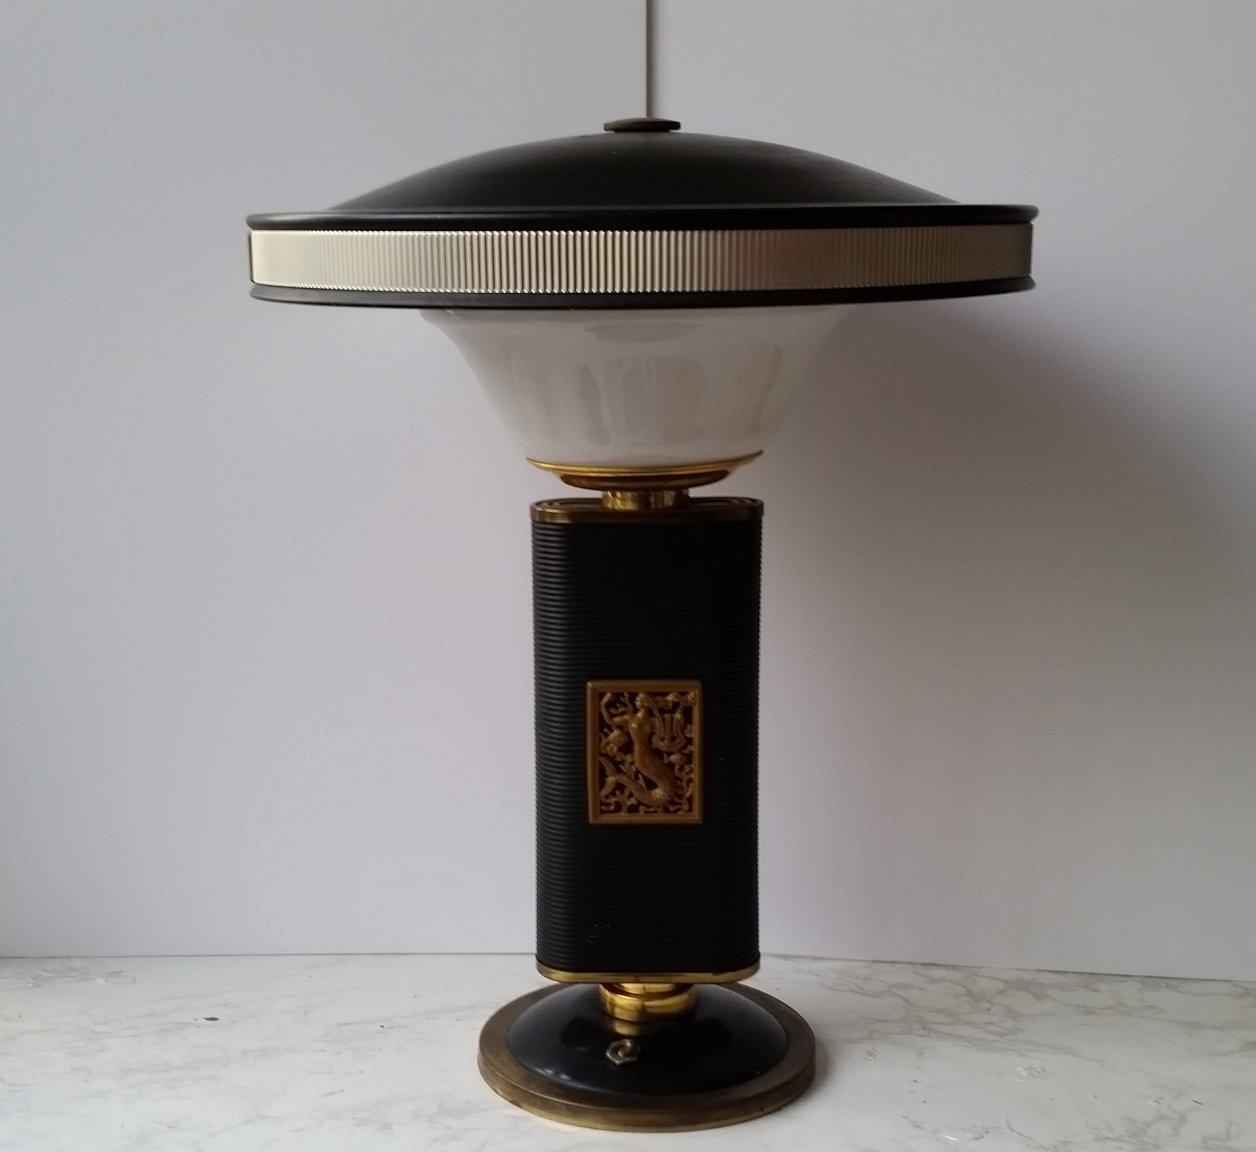 Vintage Model Mermaid Table Lamp By Eileen Gray For Sale